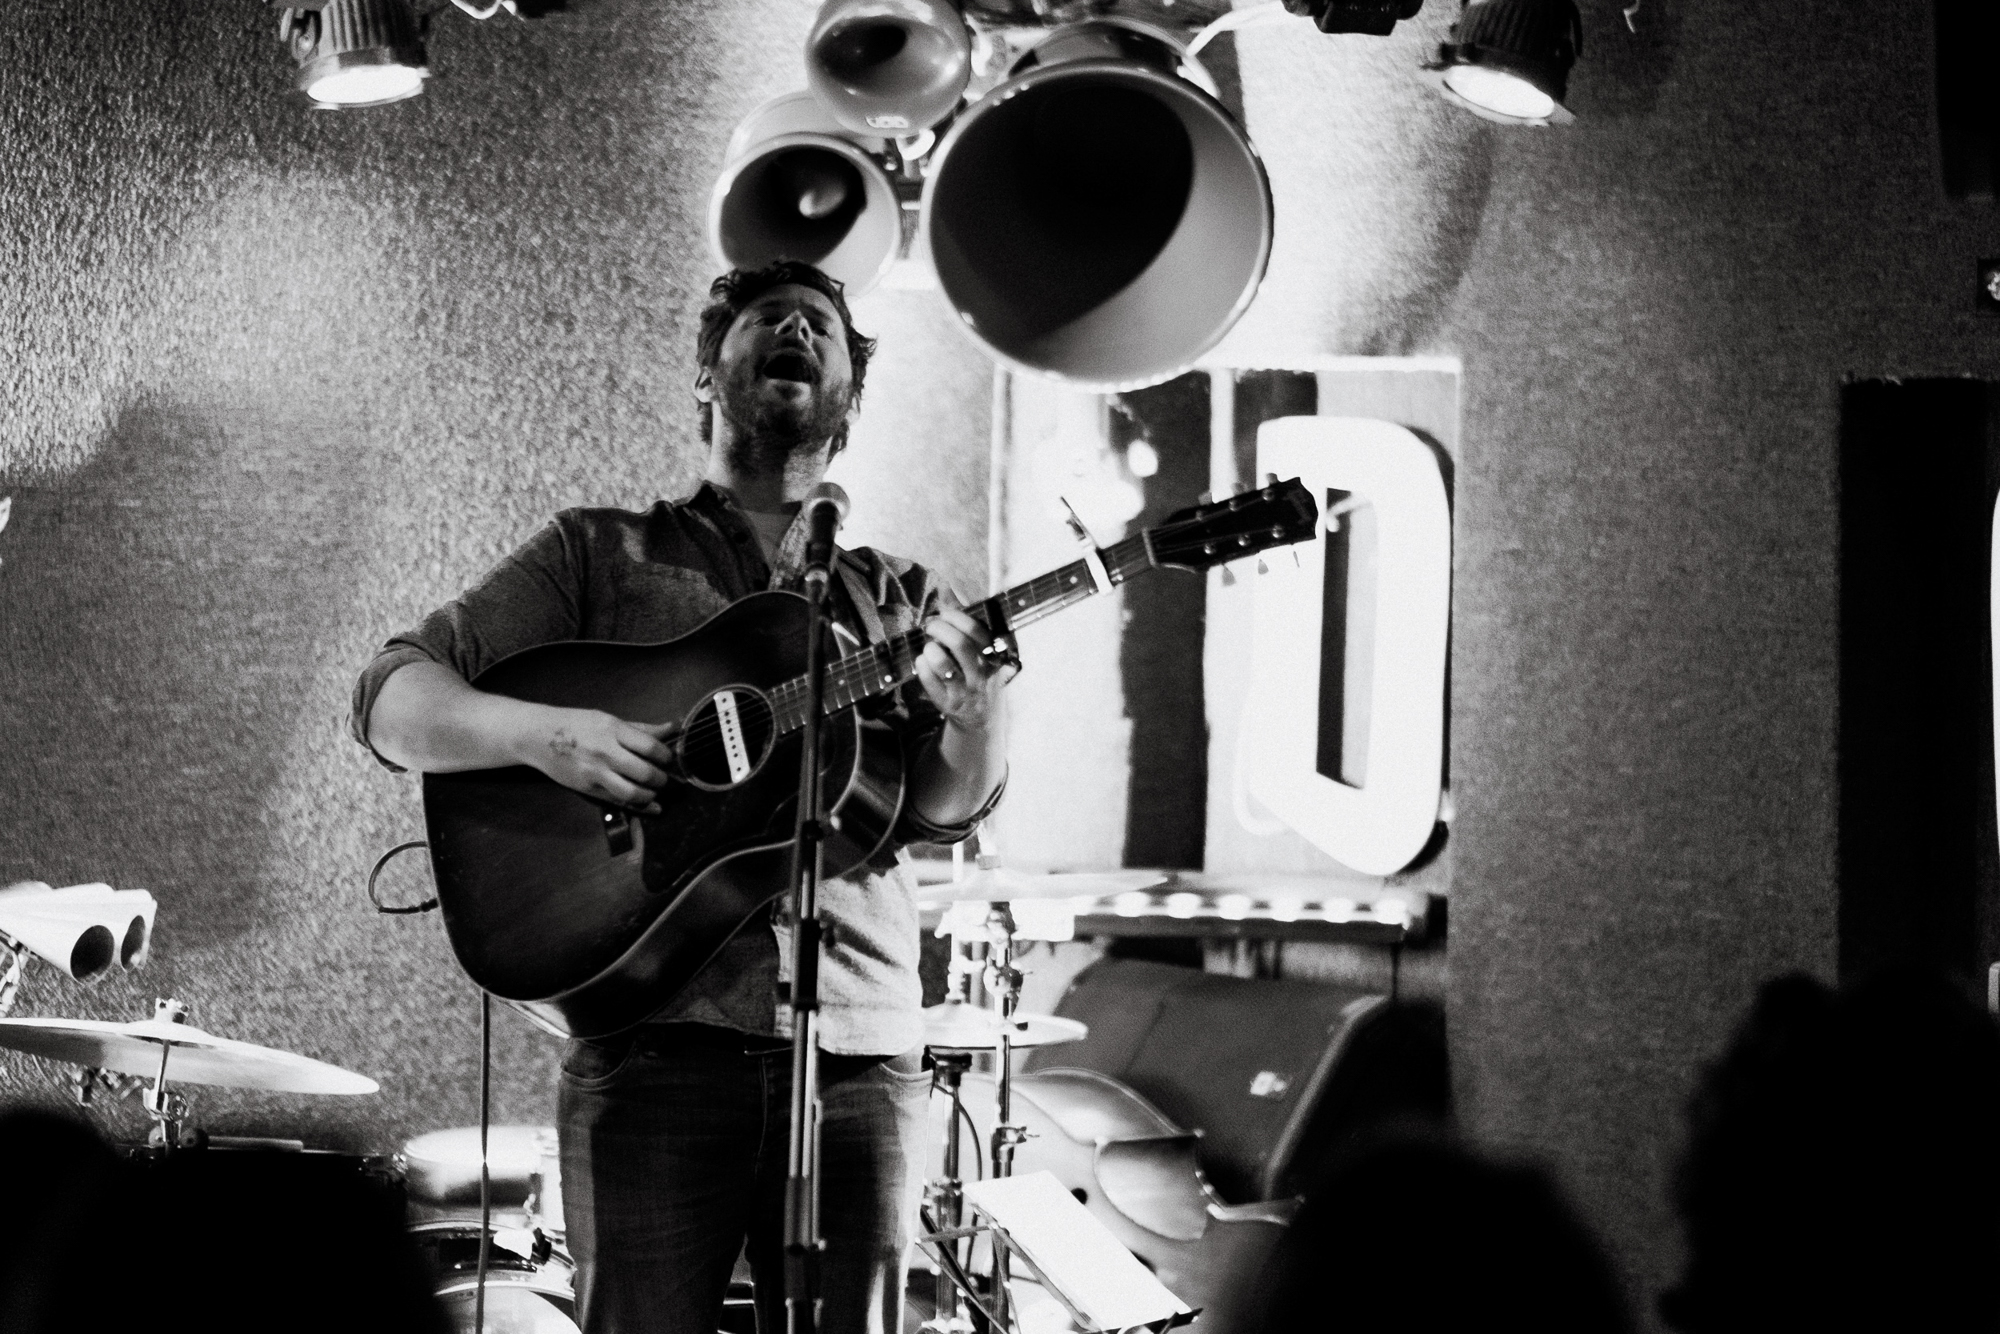 Dan Mangan opening for Laura Gibson at DC9 in Washington, D.C. - 11/26/18 (Photo by Joel Richard)